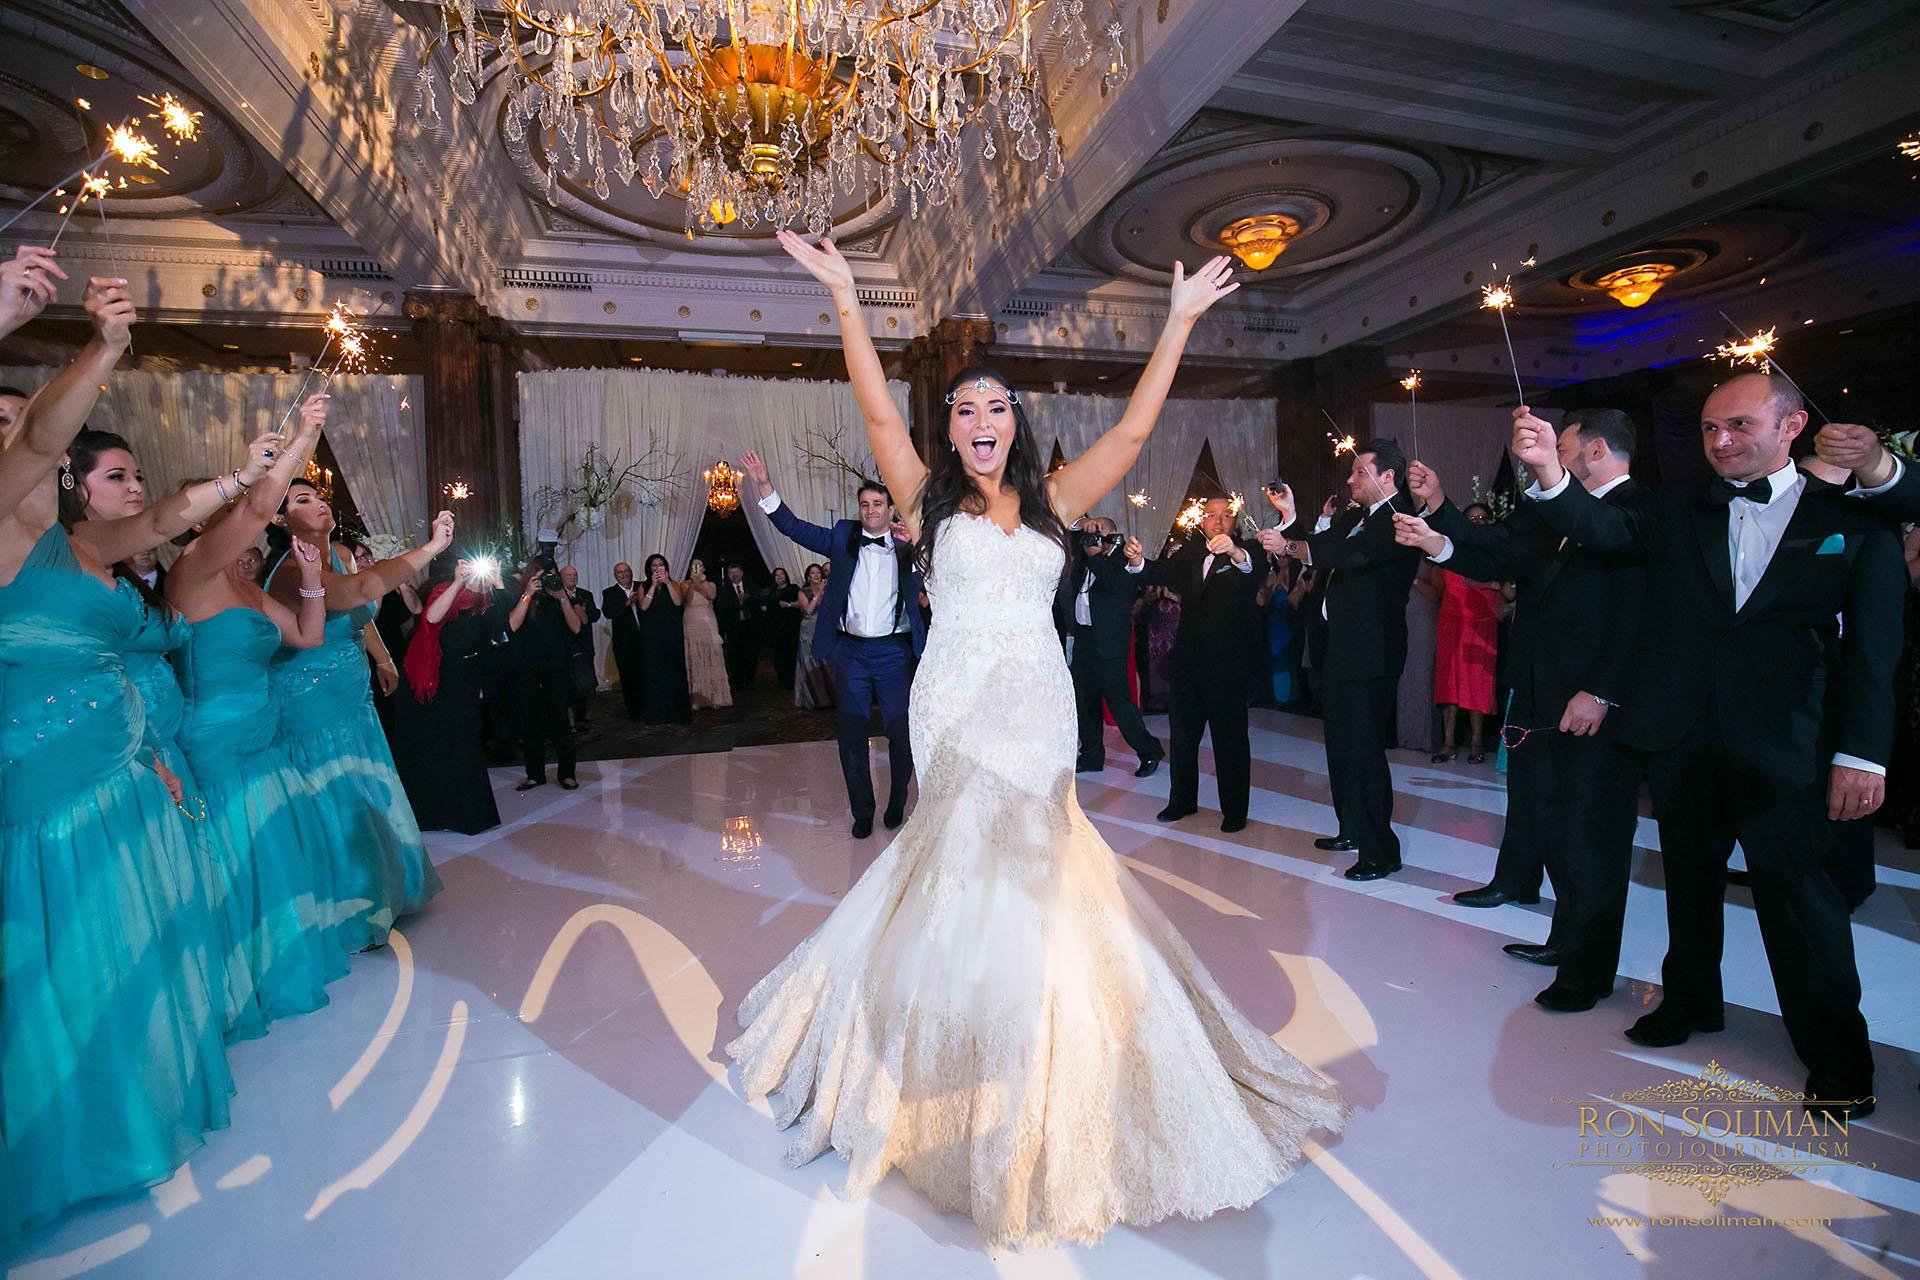 Best Crystal Tea Room Wedding photosBest Crystal Tea Room Wedding photos